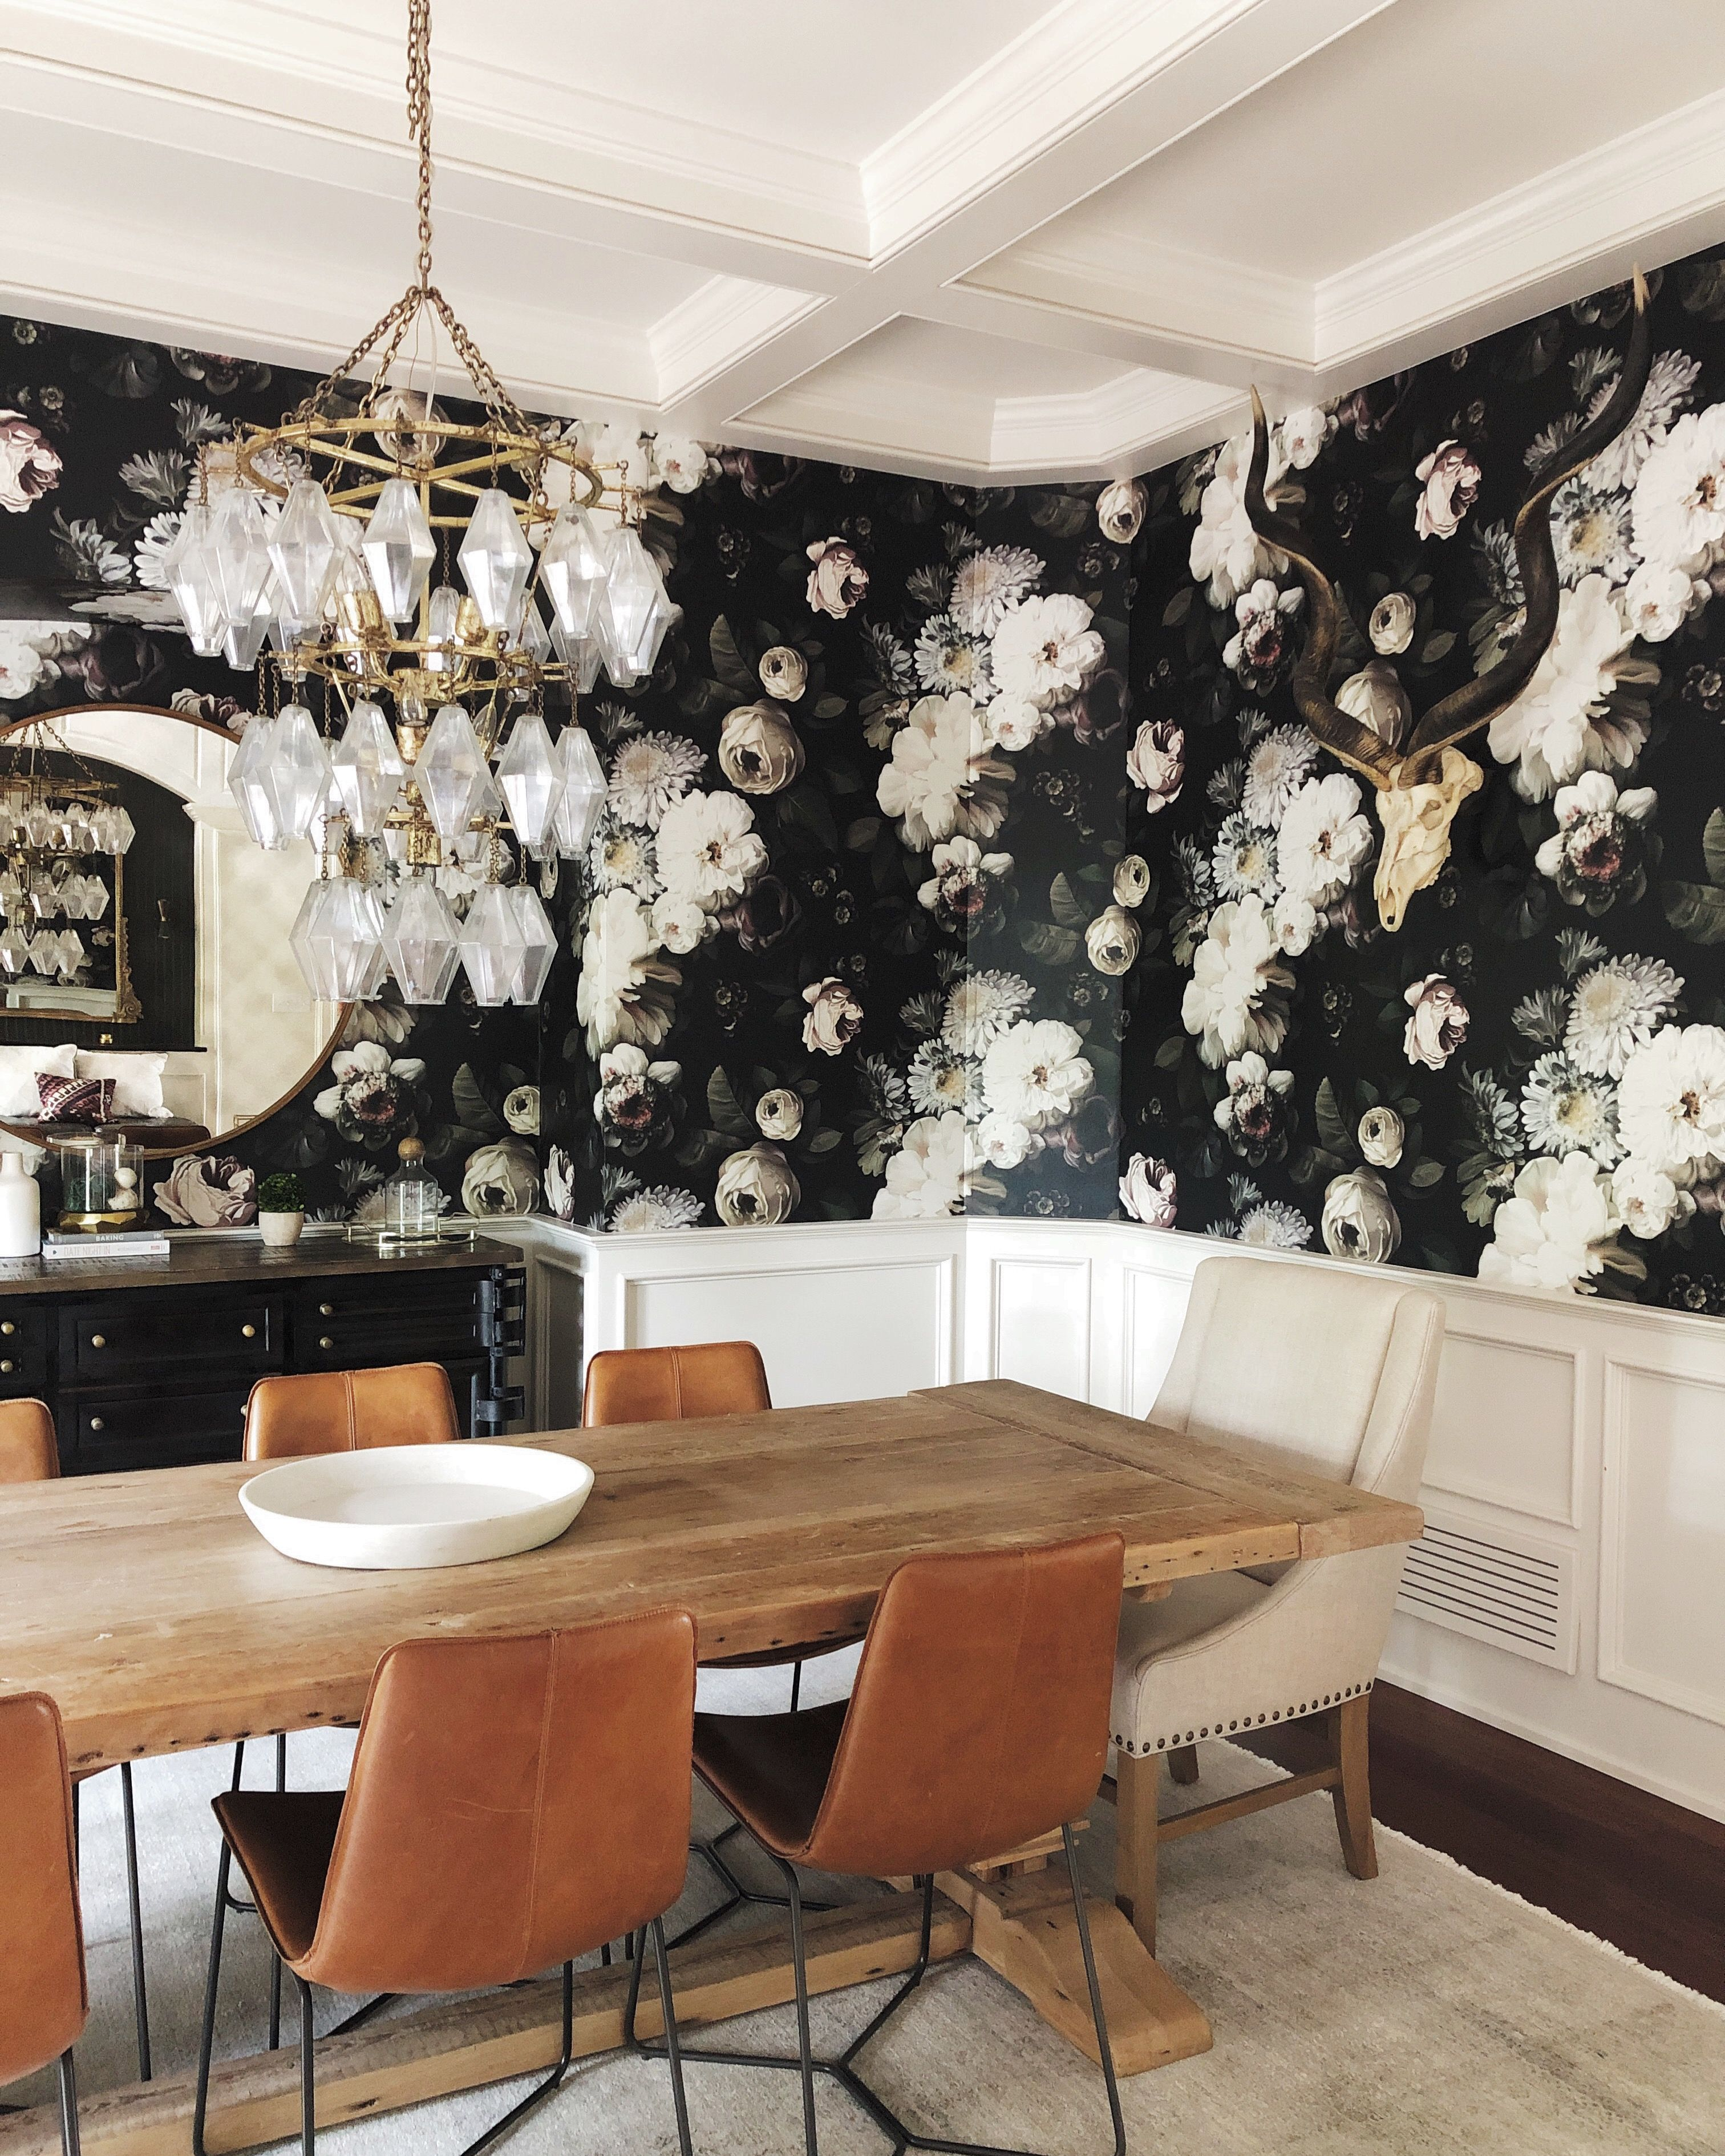 Psa These 9 Bold Wallpaper Prints Are Interior Designer Approved Hunker Bold Interior Design Wallpaper Interior Design Dining Room Wallpaper